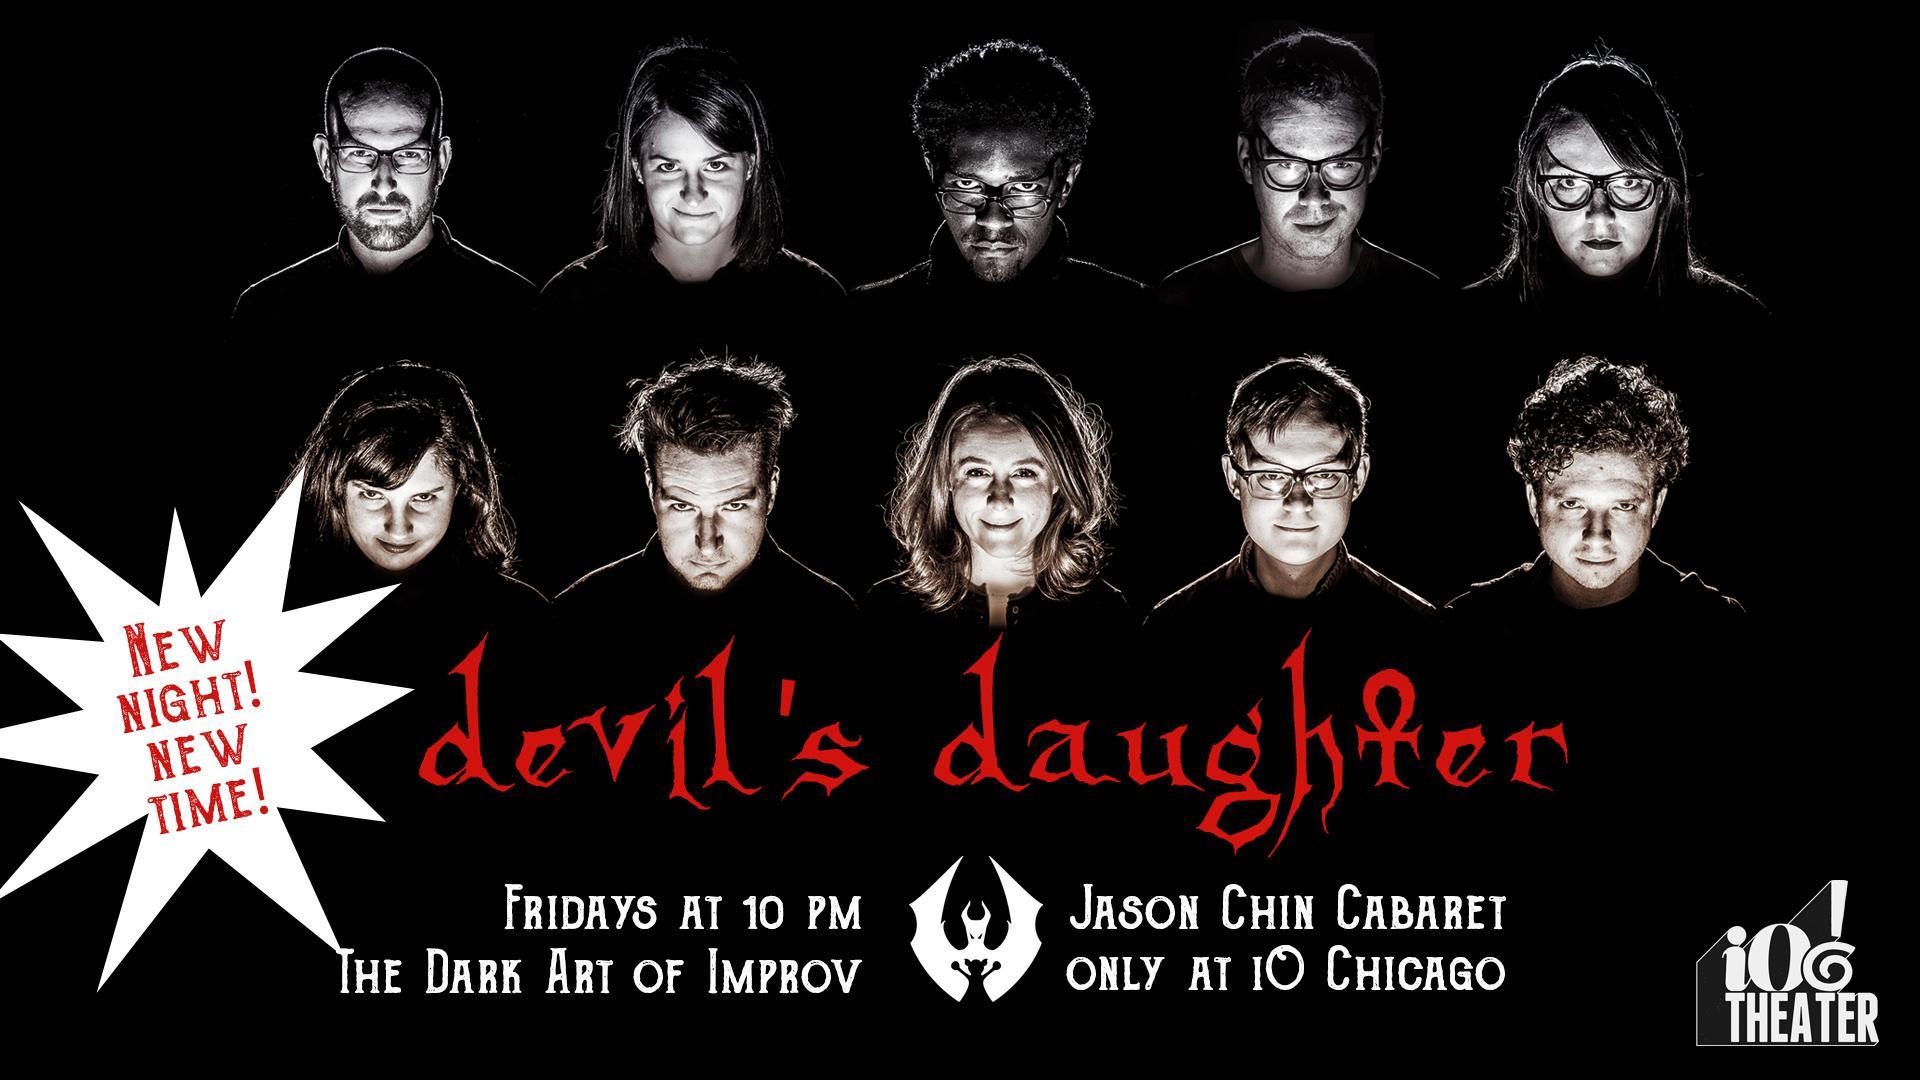 HAROLD NIGHT w/ Devil's Daughter